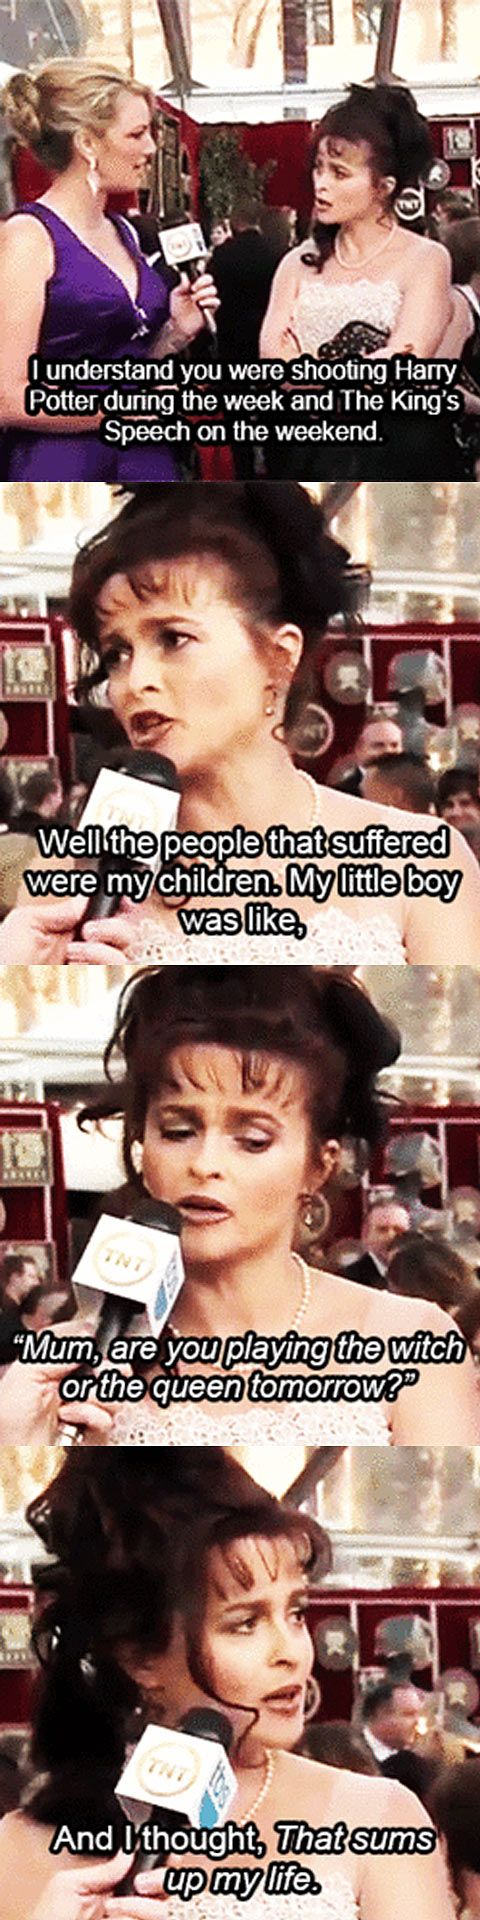 Helena Bonham Carter at the 2011 SAG Awards...